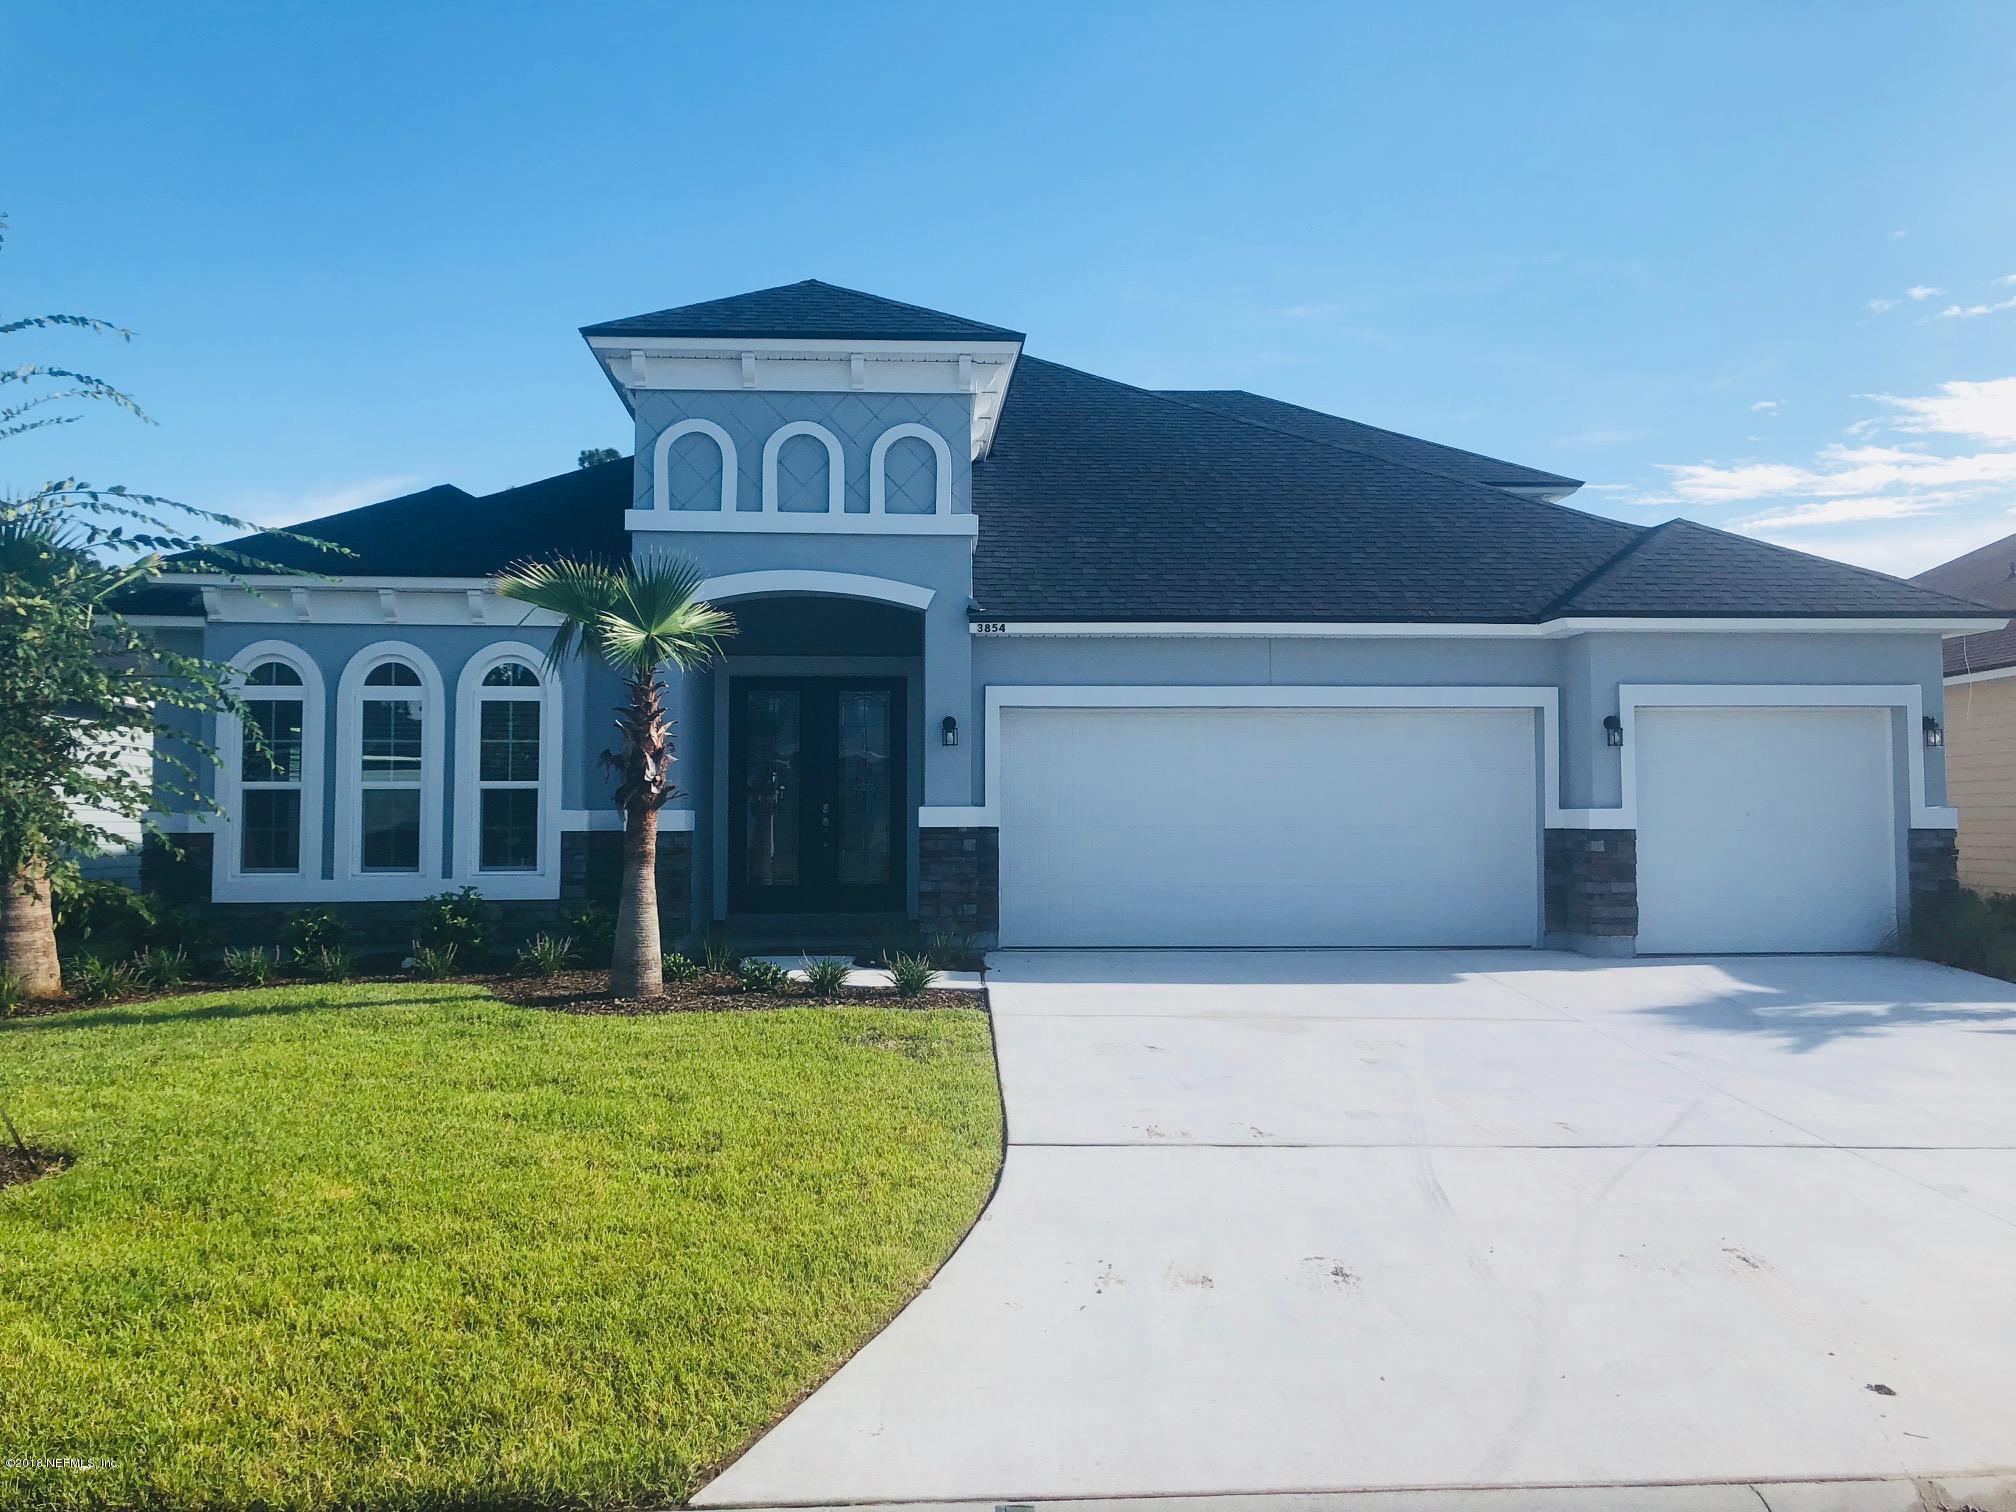 3854 HAMMOCK BLUFF, JACKSONVILLE, FLORIDA 32226, 4 Bedrooms Bedrooms, ,4 BathroomsBathrooms,Residential - single family,For sale,HAMMOCK BLUFF,905336